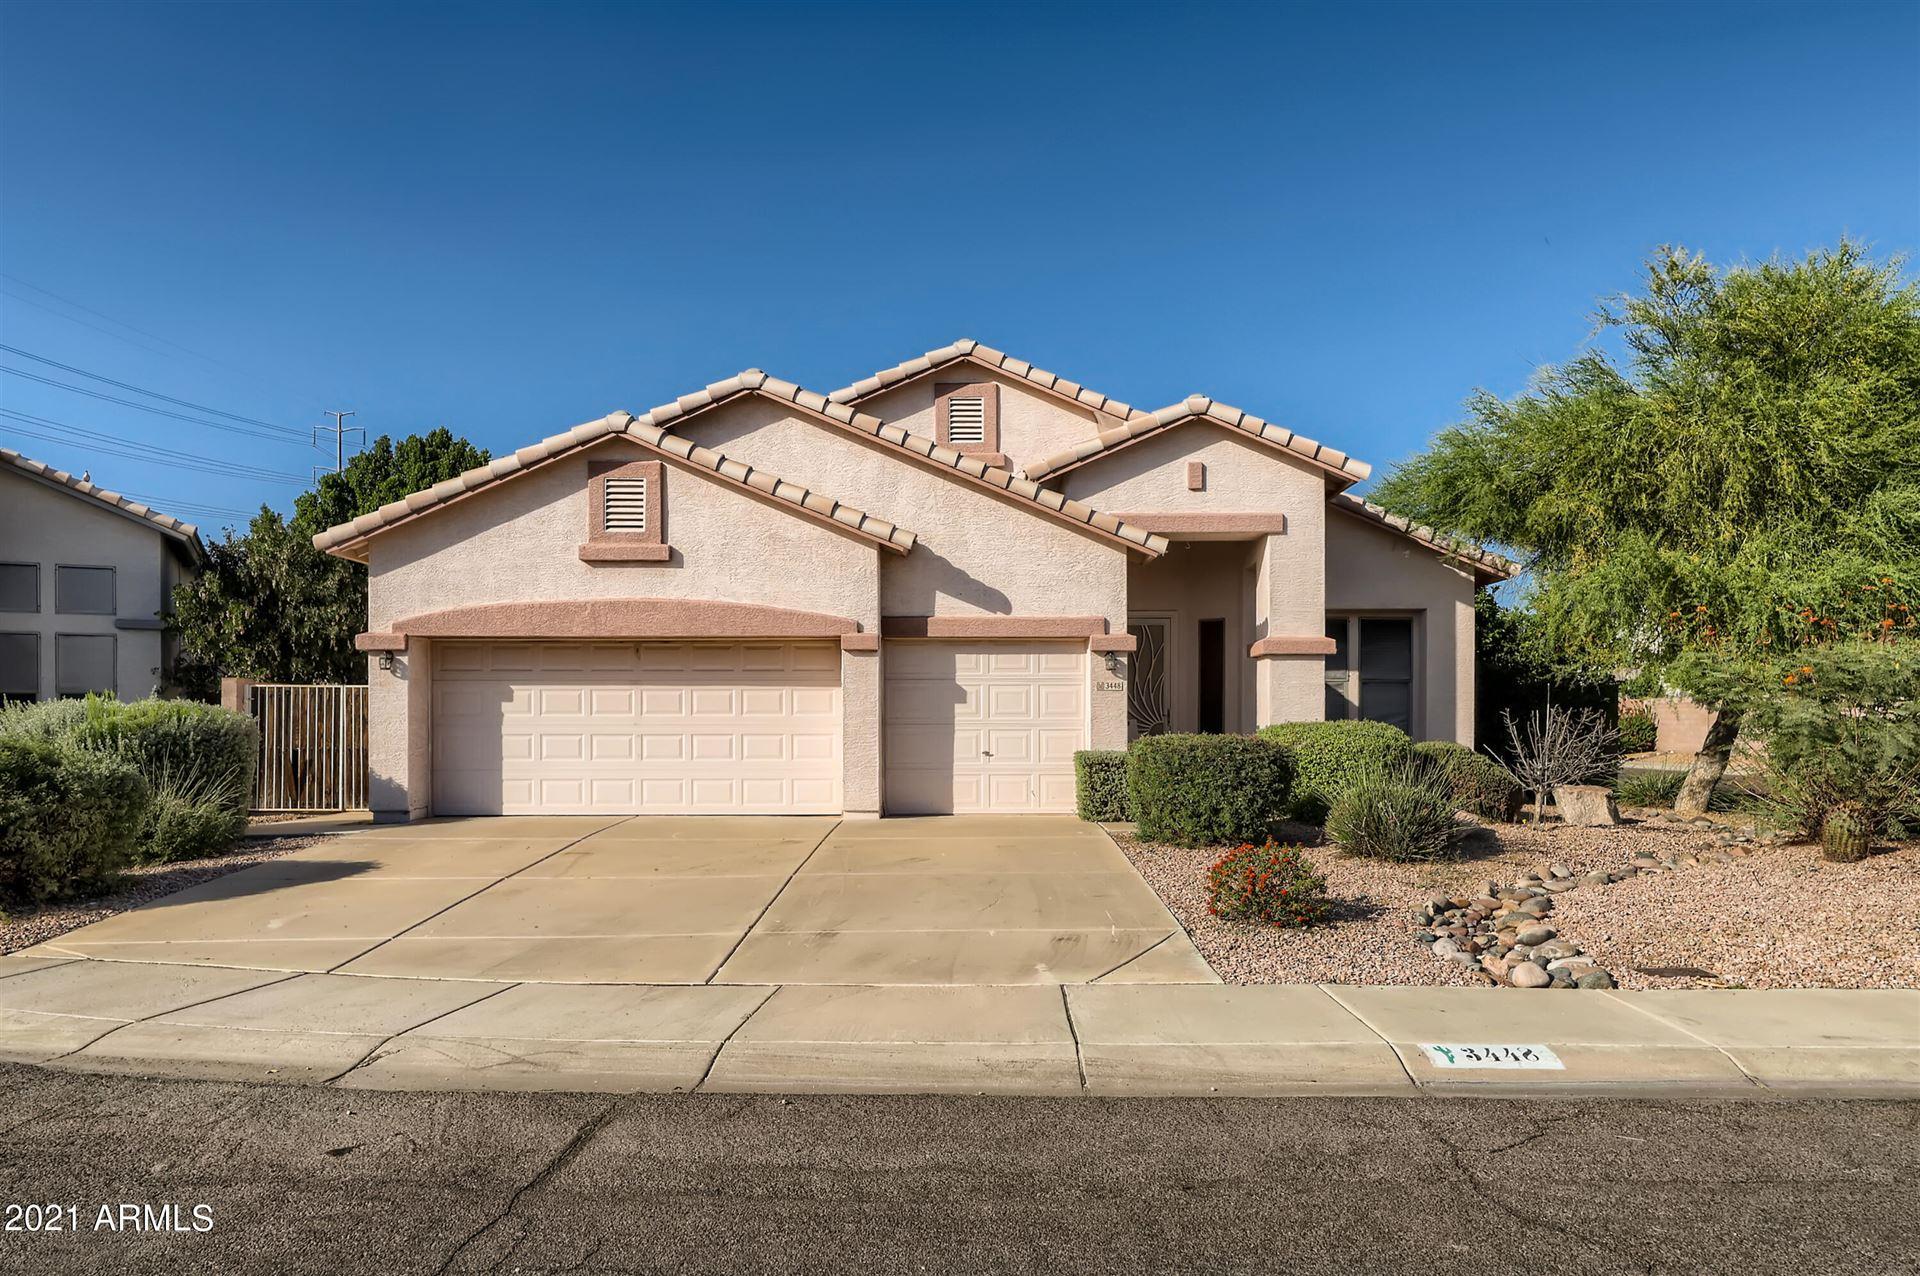 3448 W SANDS Drive, Phoenix, AZ 85027 - MLS#: 6312603